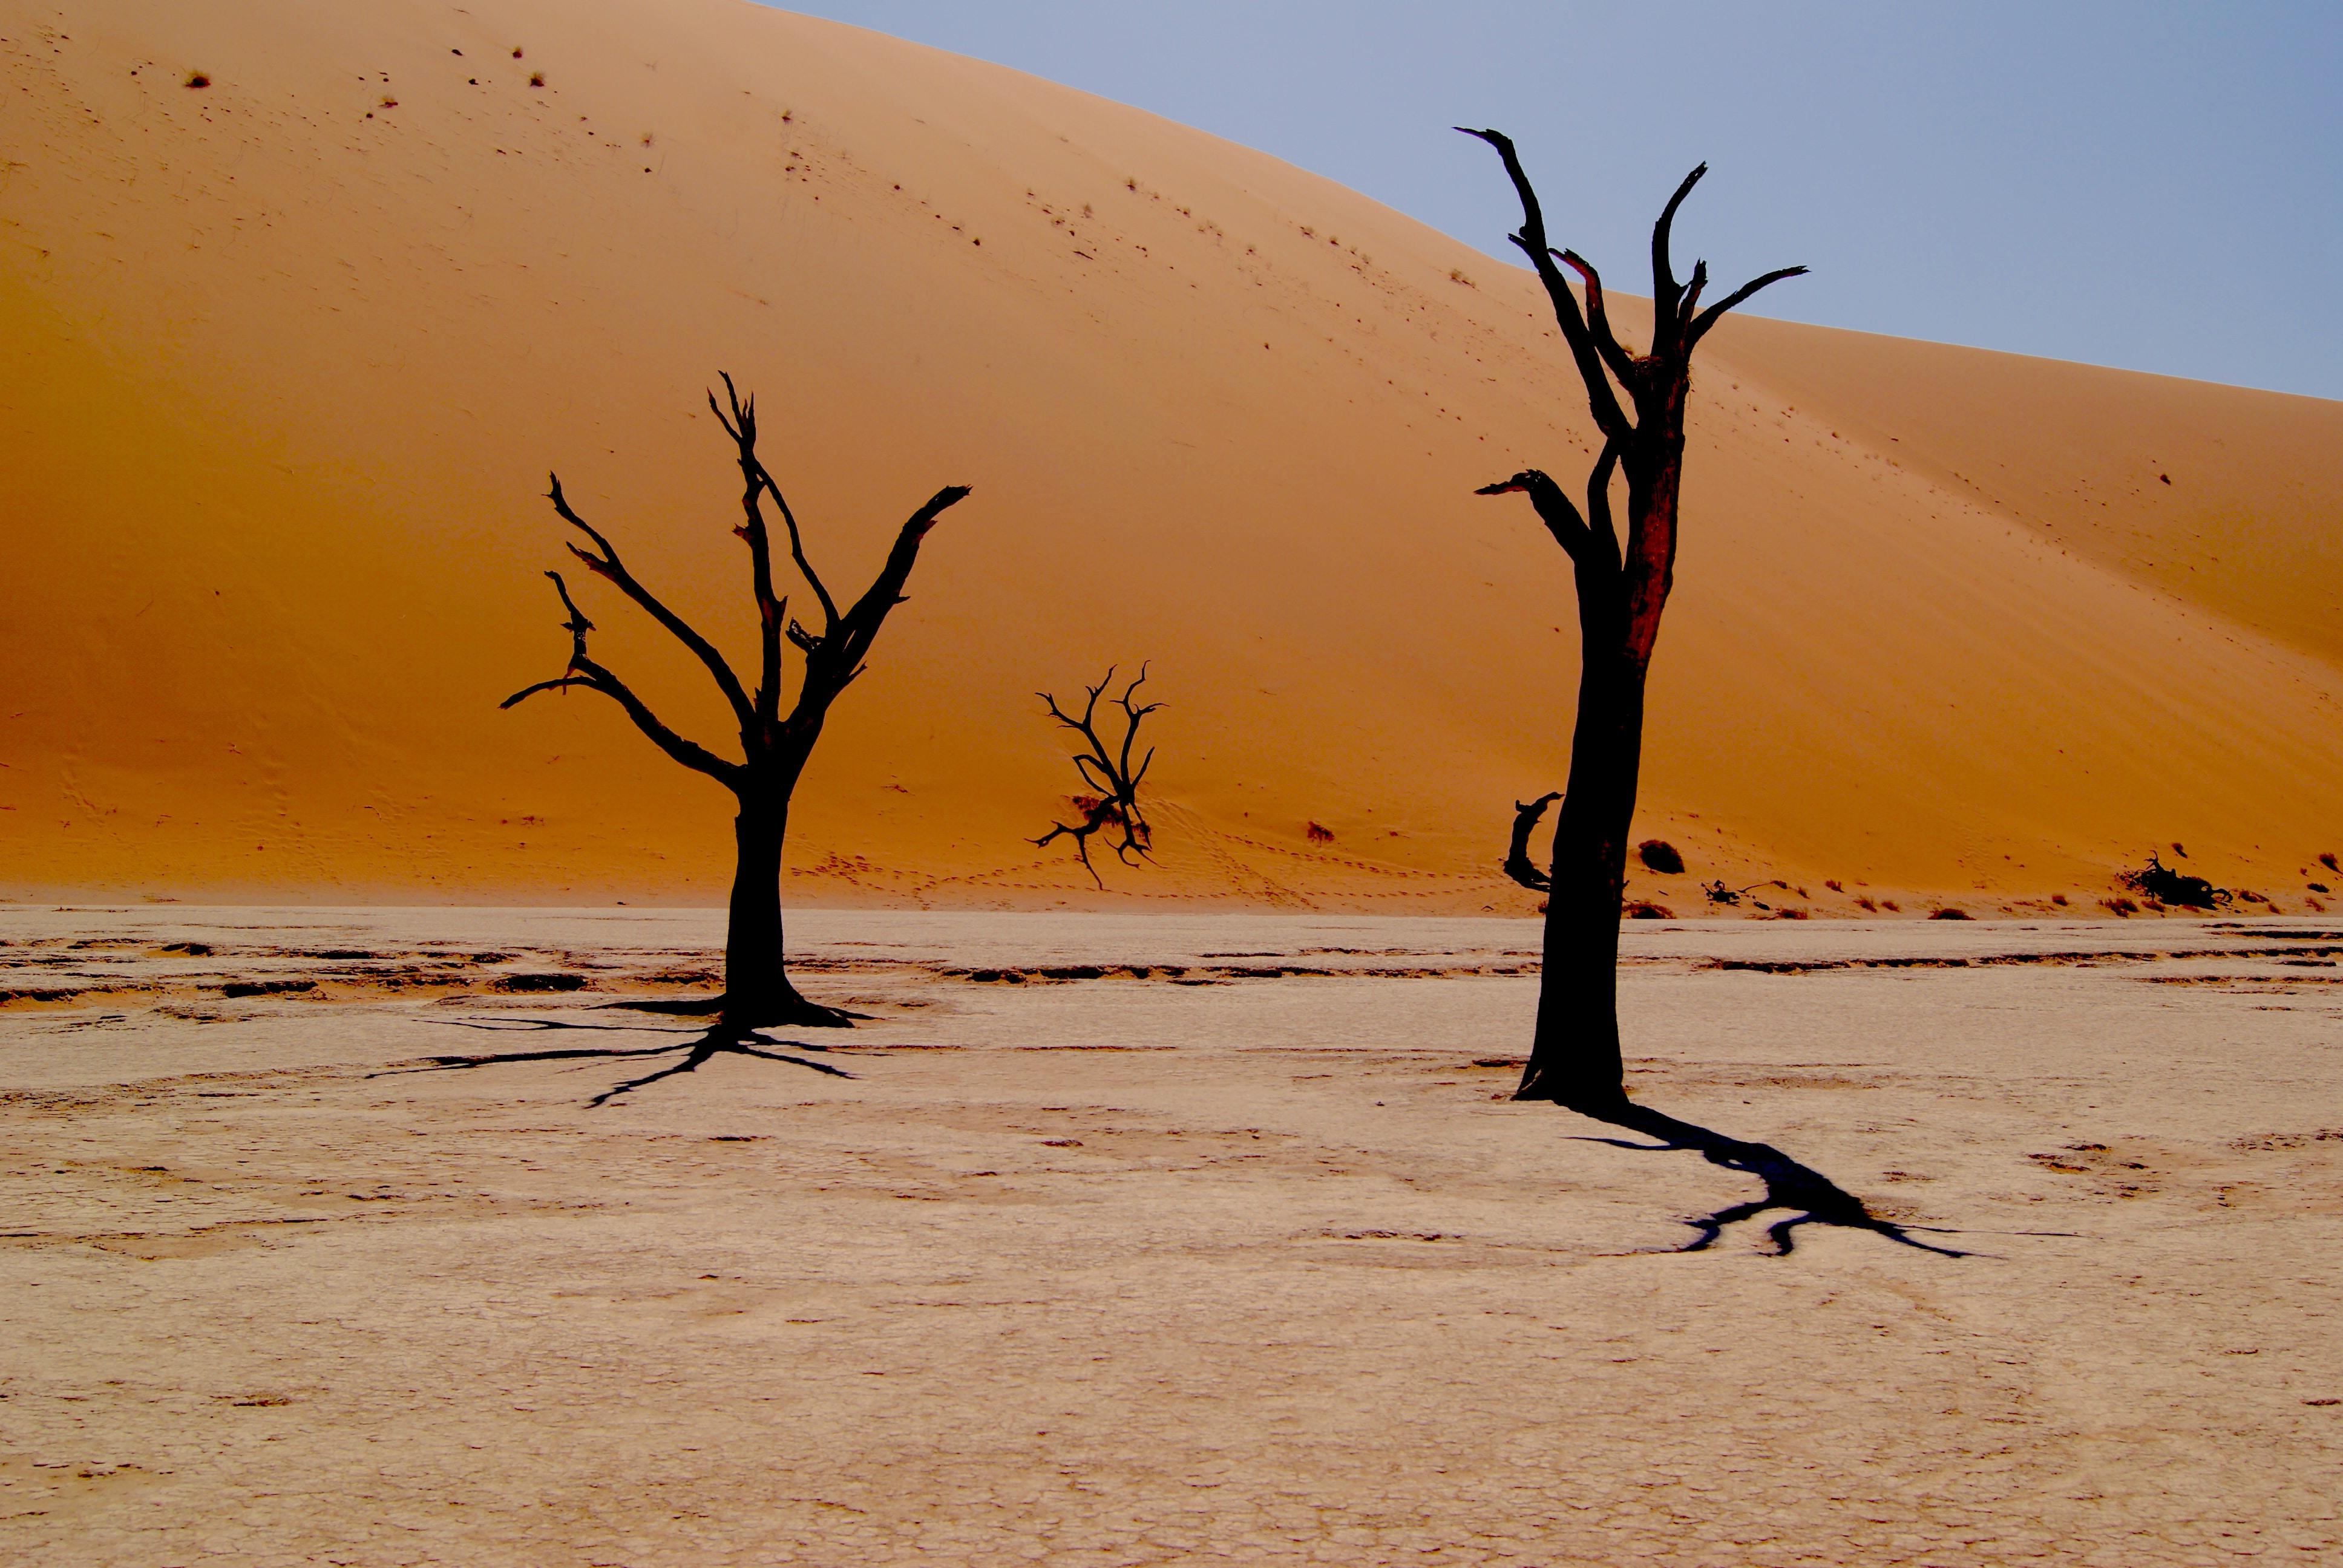 Desolate trees in the sandy desert of Deadvlei Hiking Trail